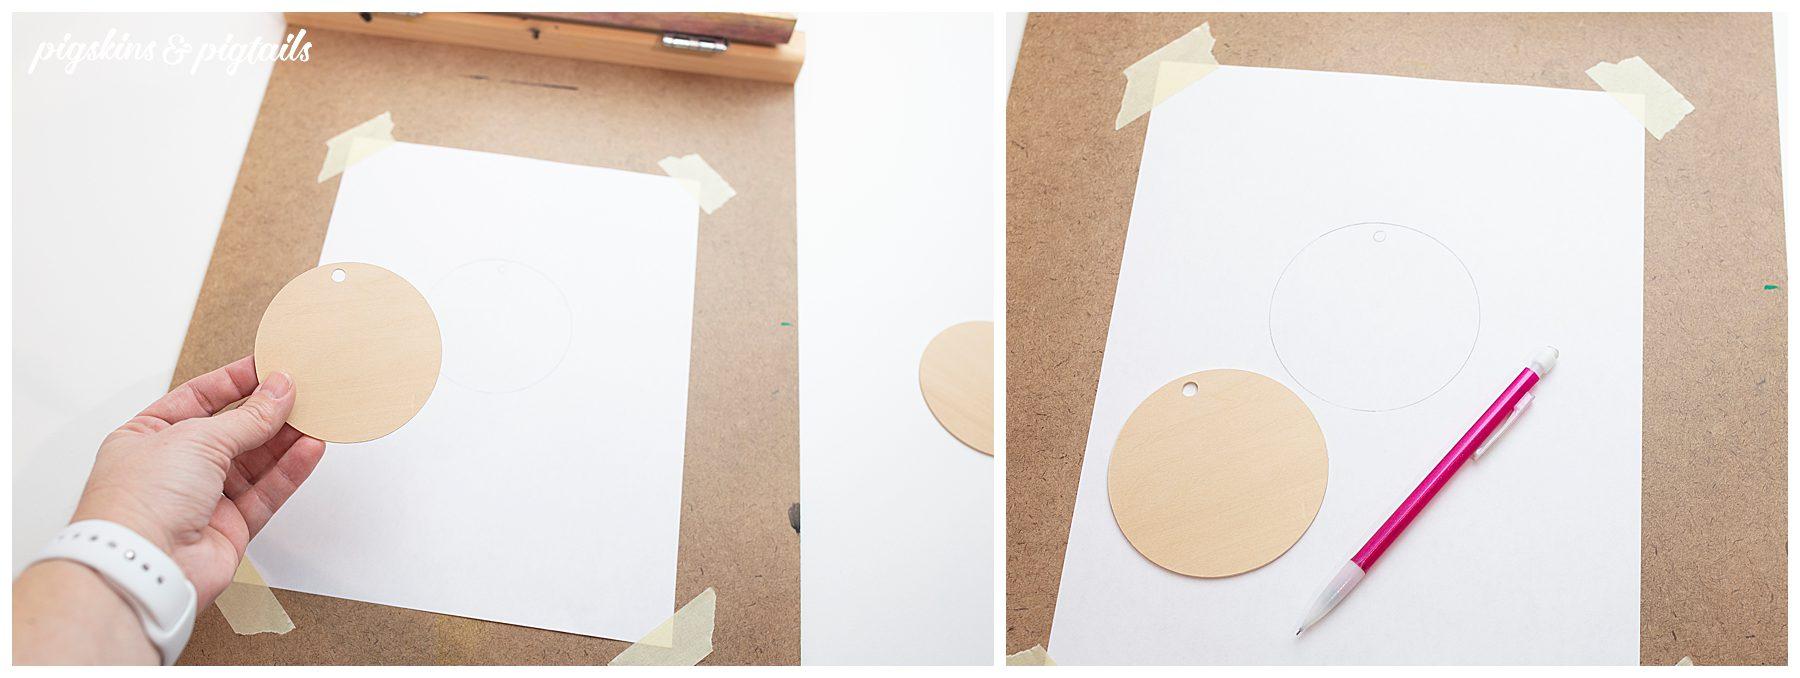 screen printing ornaments tutorial